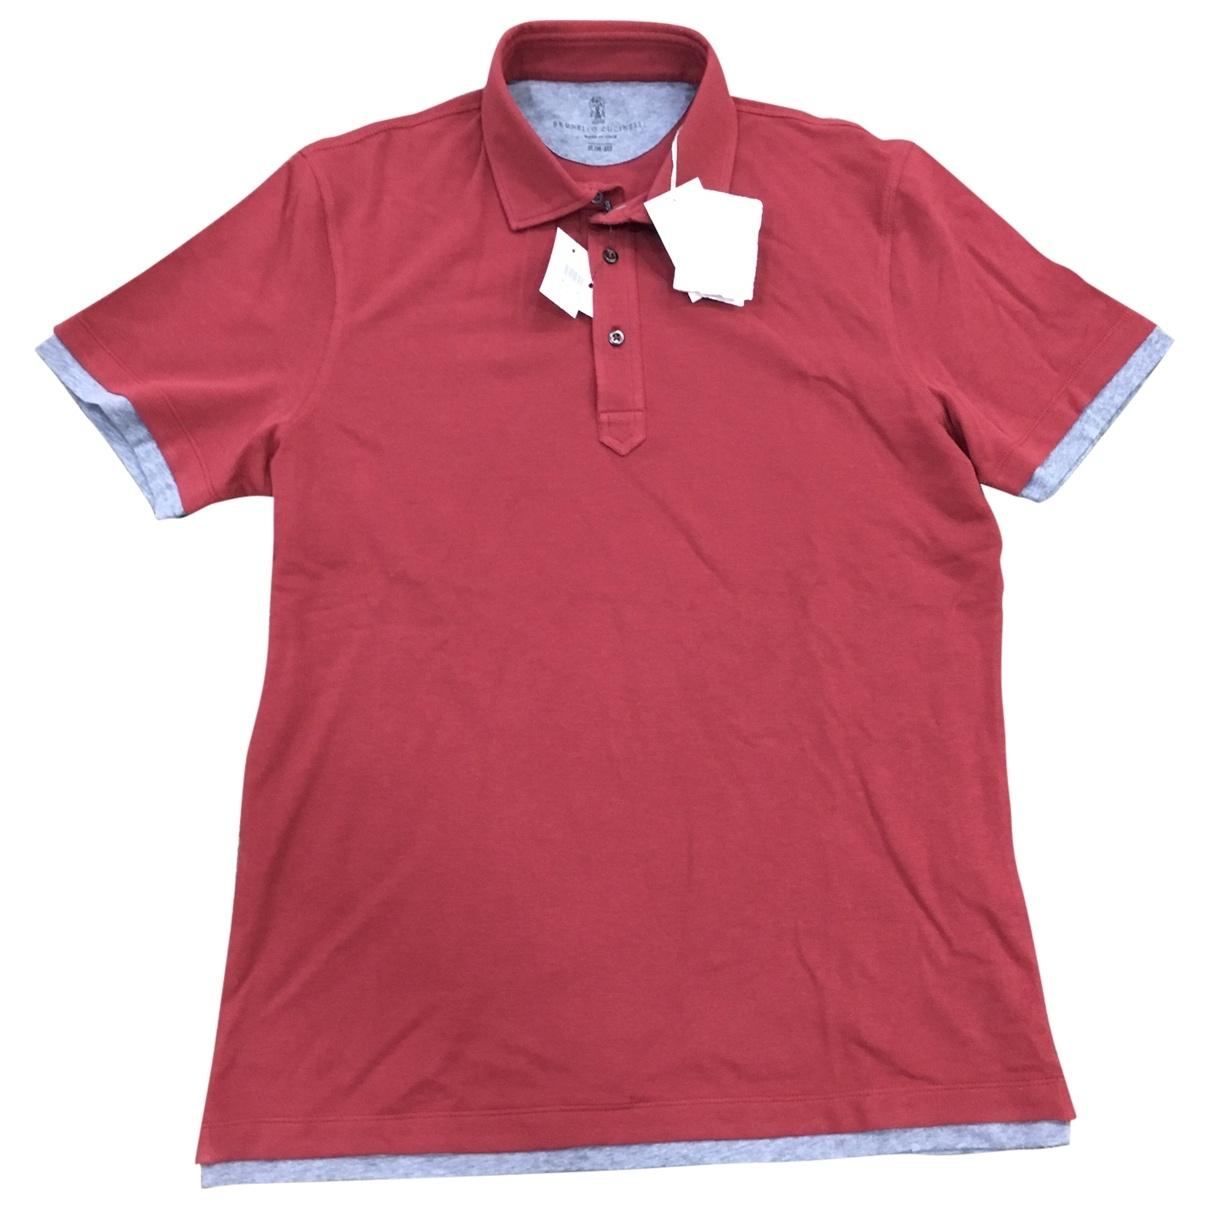 Polo en Algodon Rojo Brunello Cucinelli